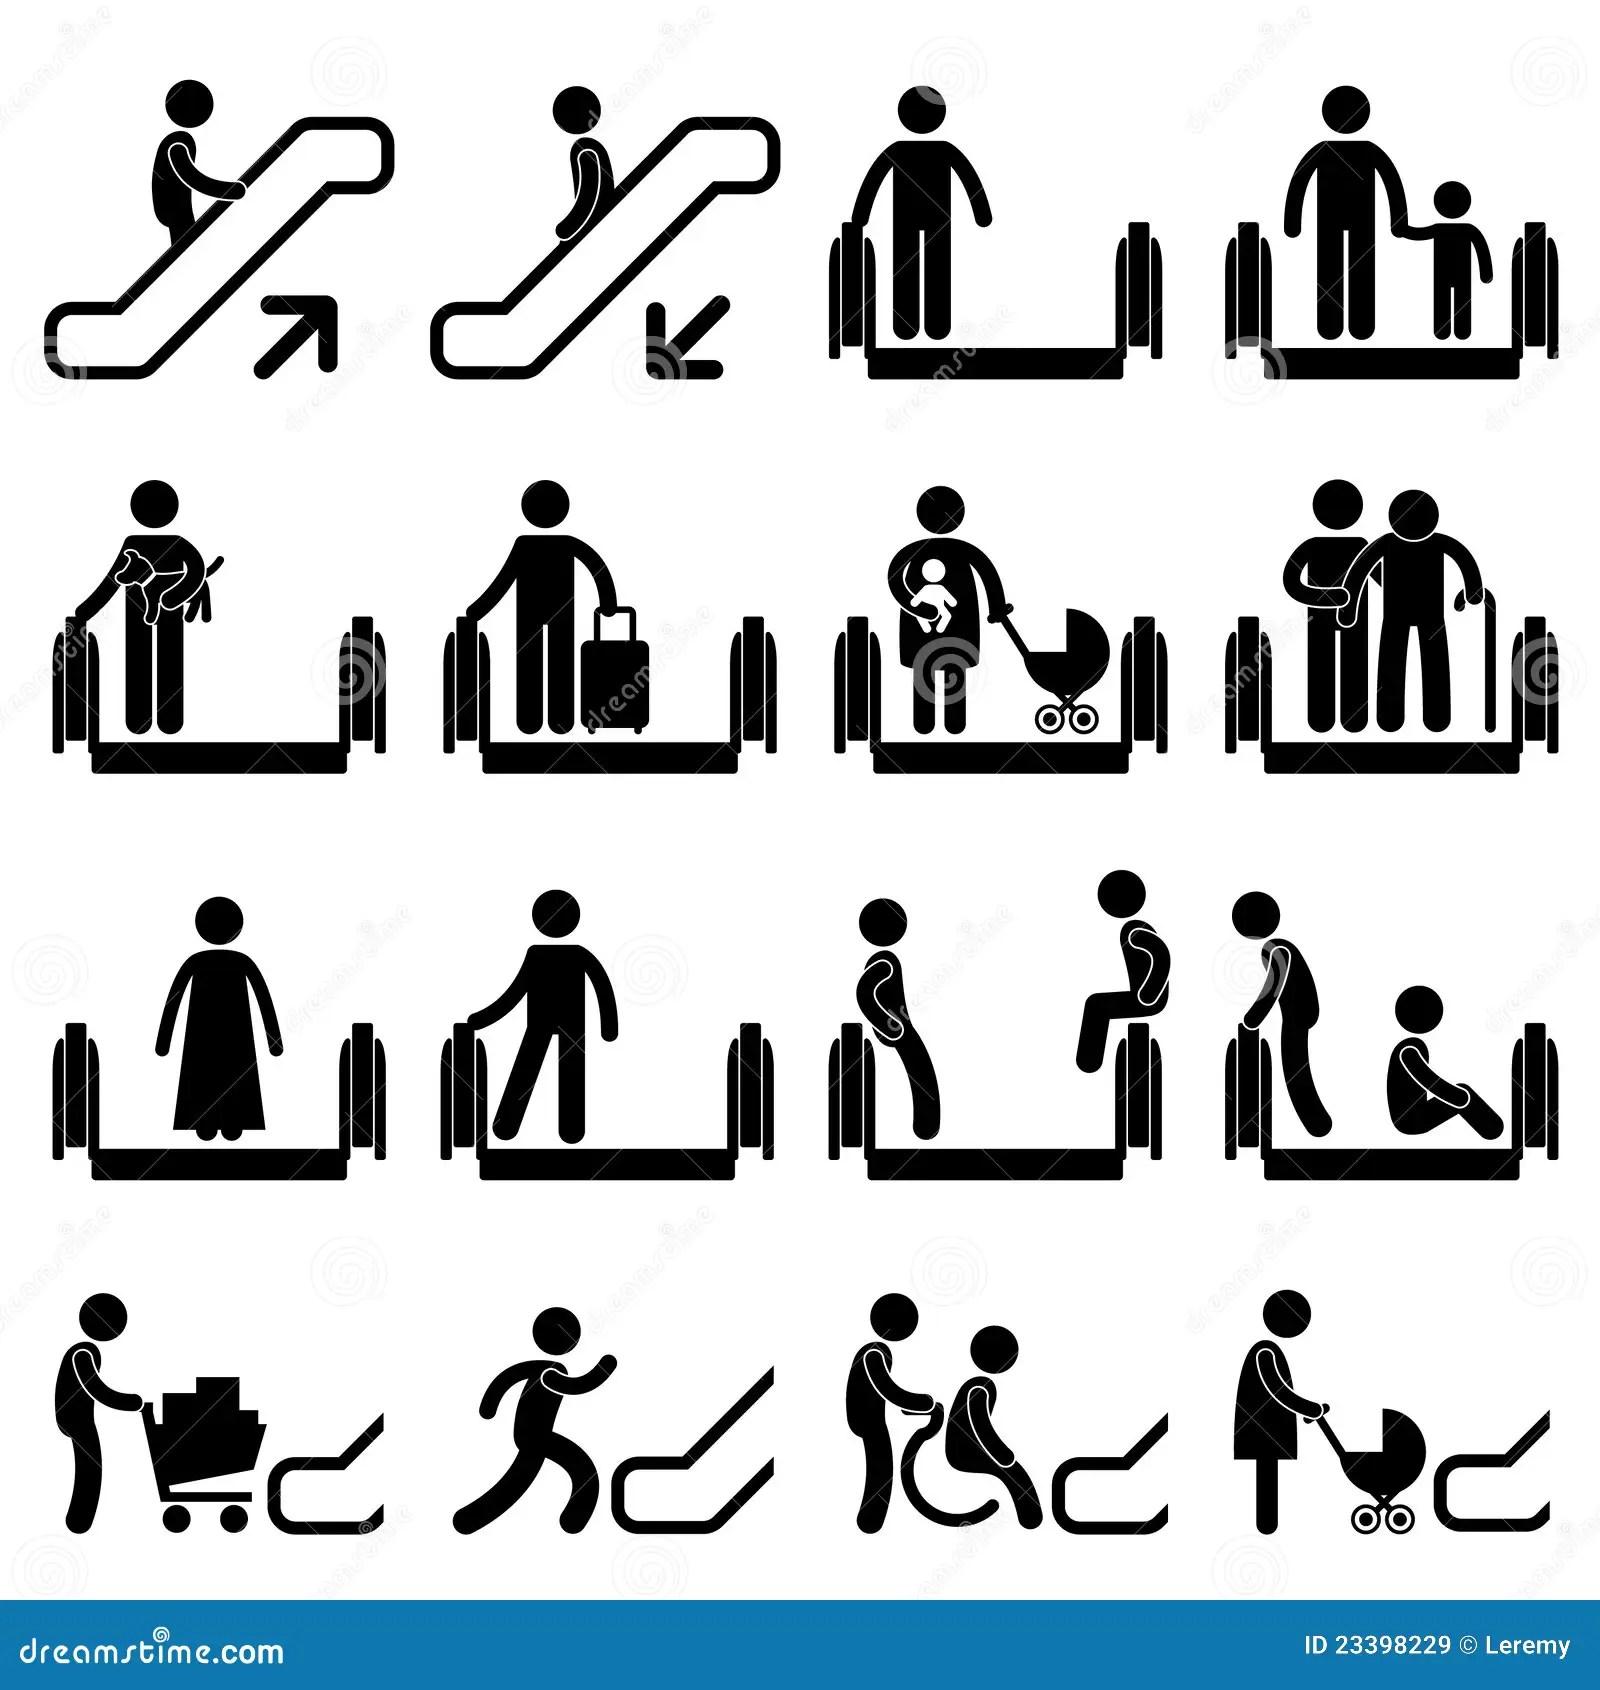 Senal De Peligro De La Escalera Movil Ilustracion Del